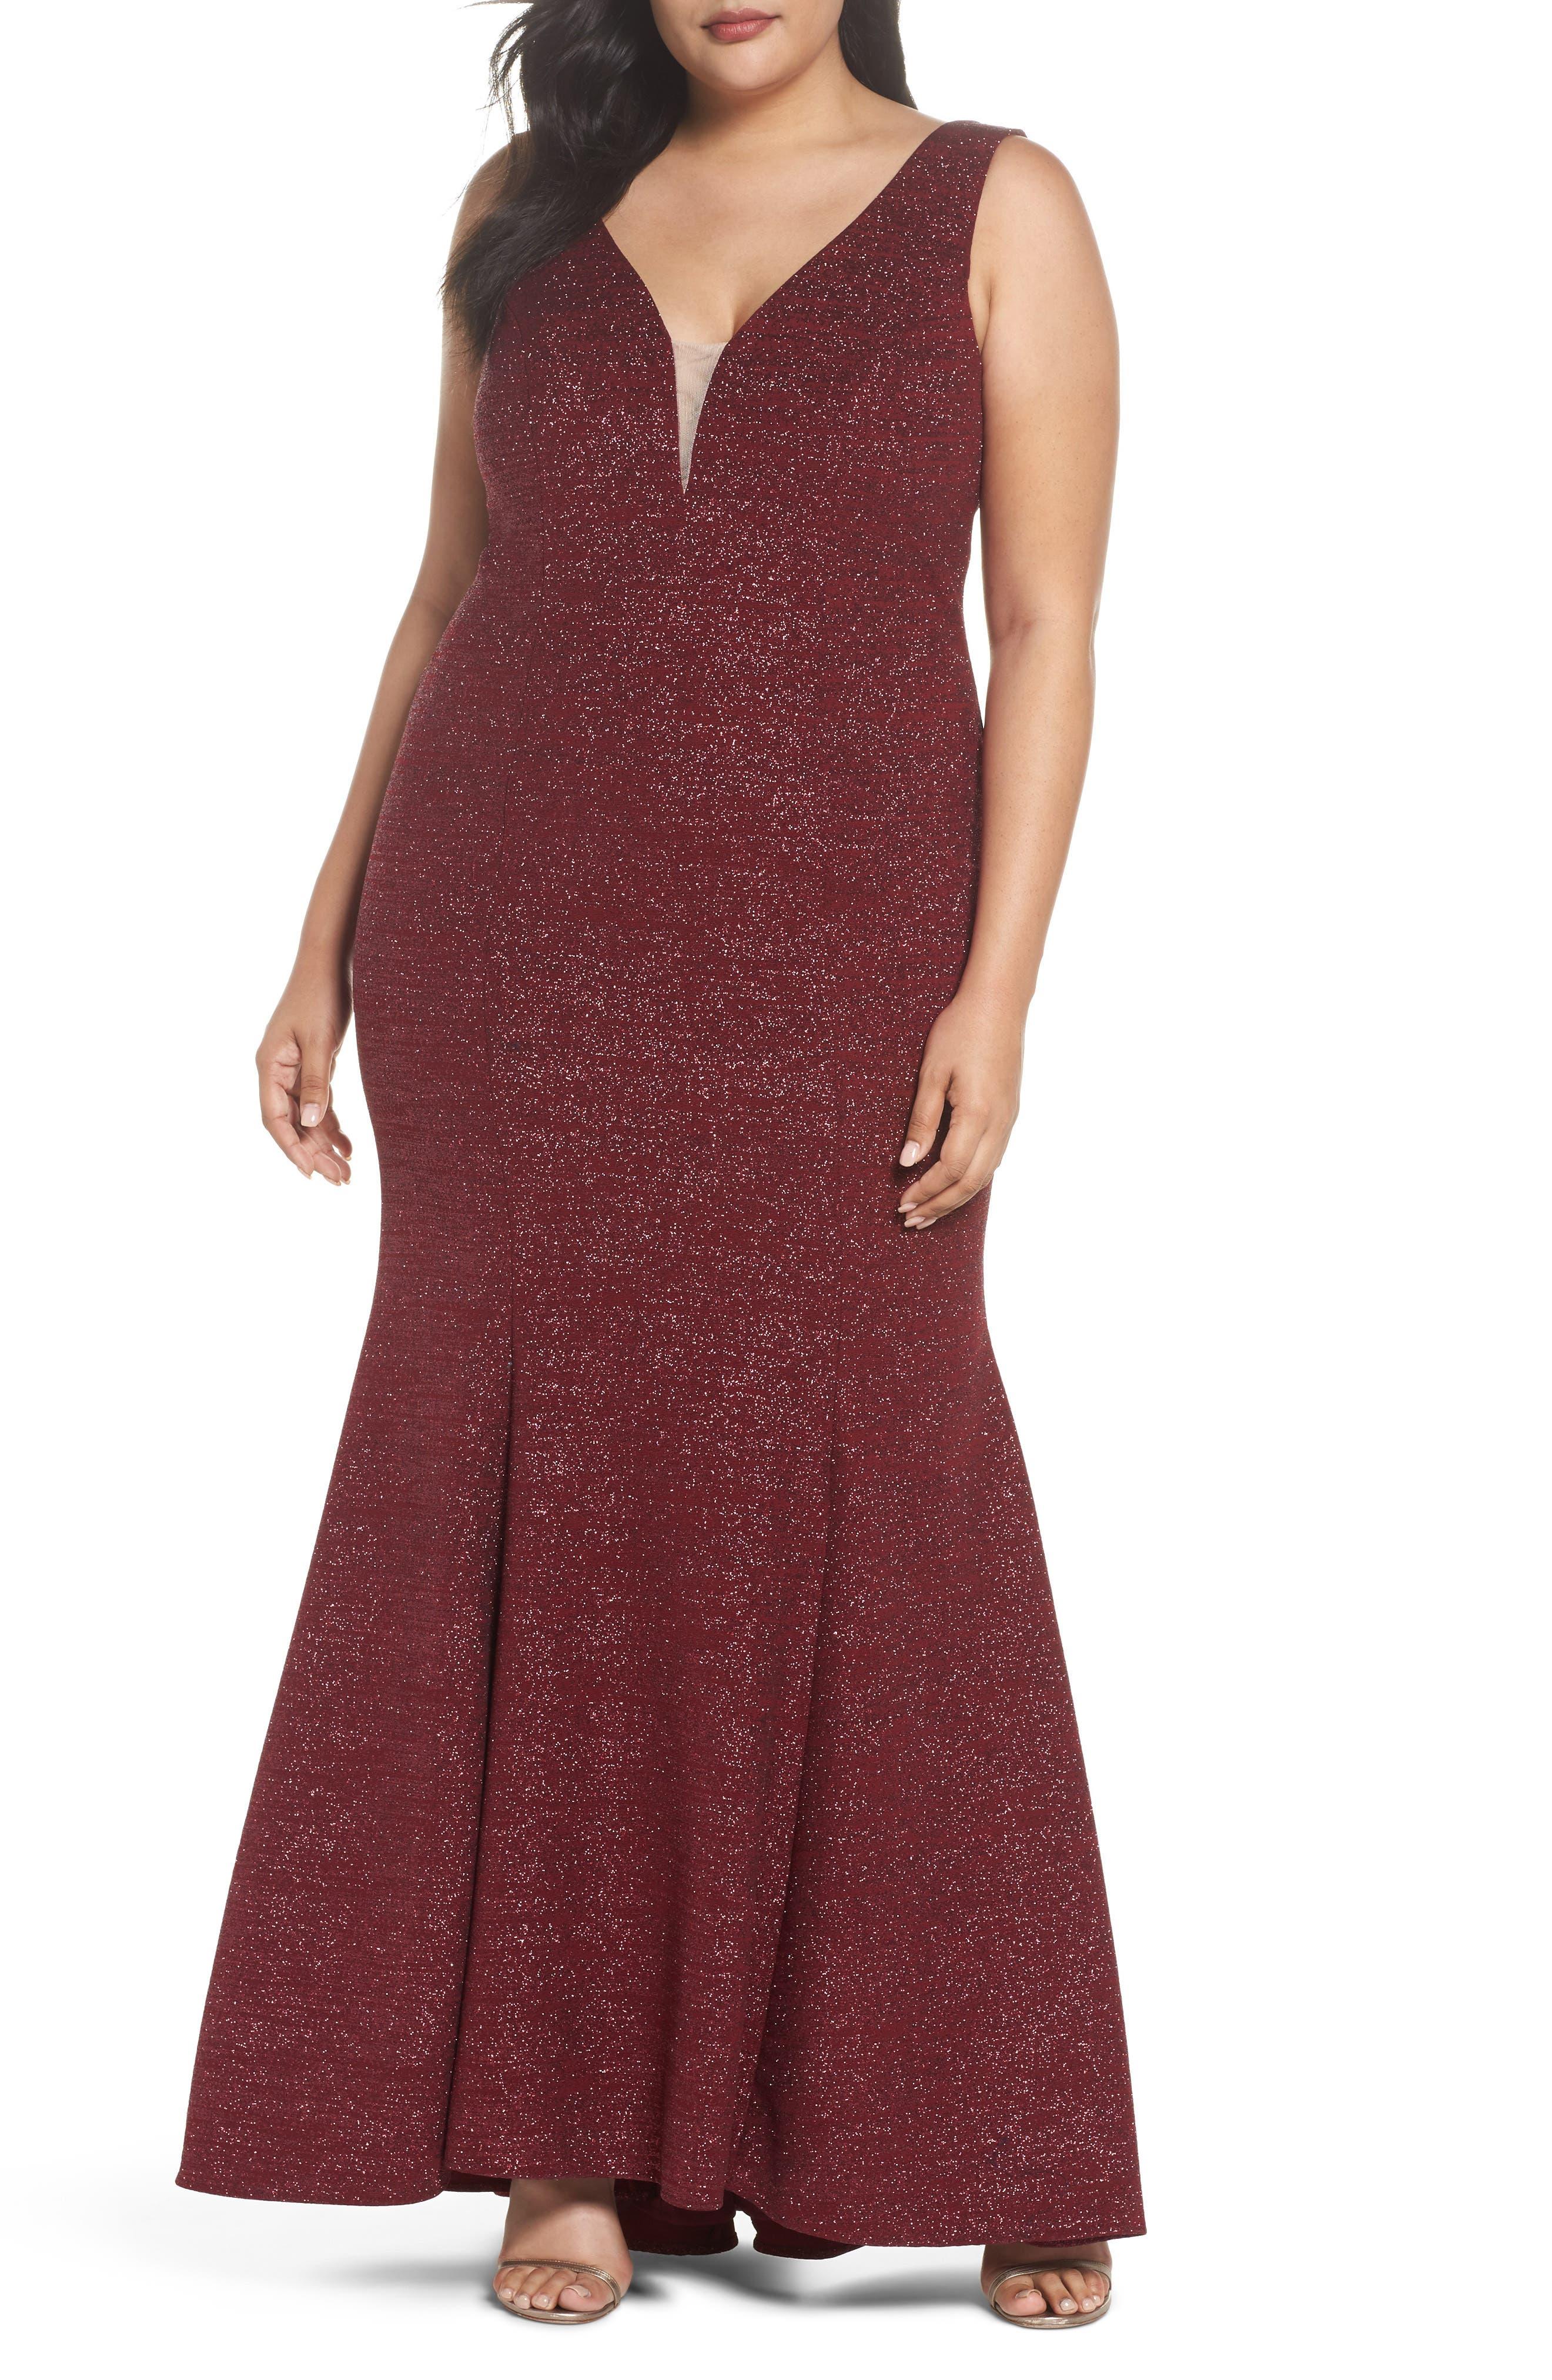 Metallic Knit Mermaid Gown,                             Main thumbnail 1, color,                             600